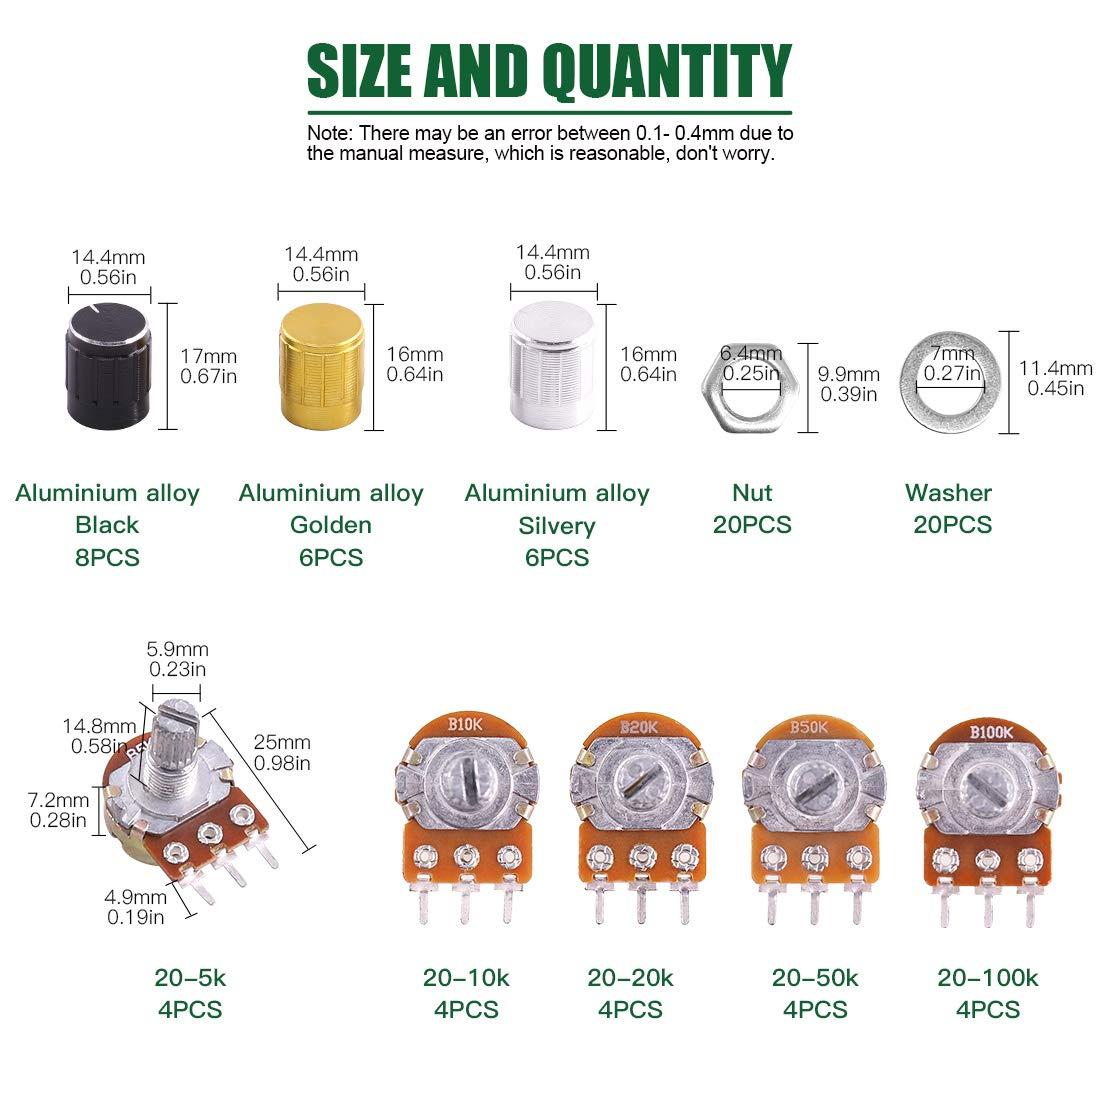 Keadic 40Pcs Knurled Shaft Linear Rotary Taper Potentiometer 5K-100K Ohm Assortment Kit with 3 Colors Knob WH148